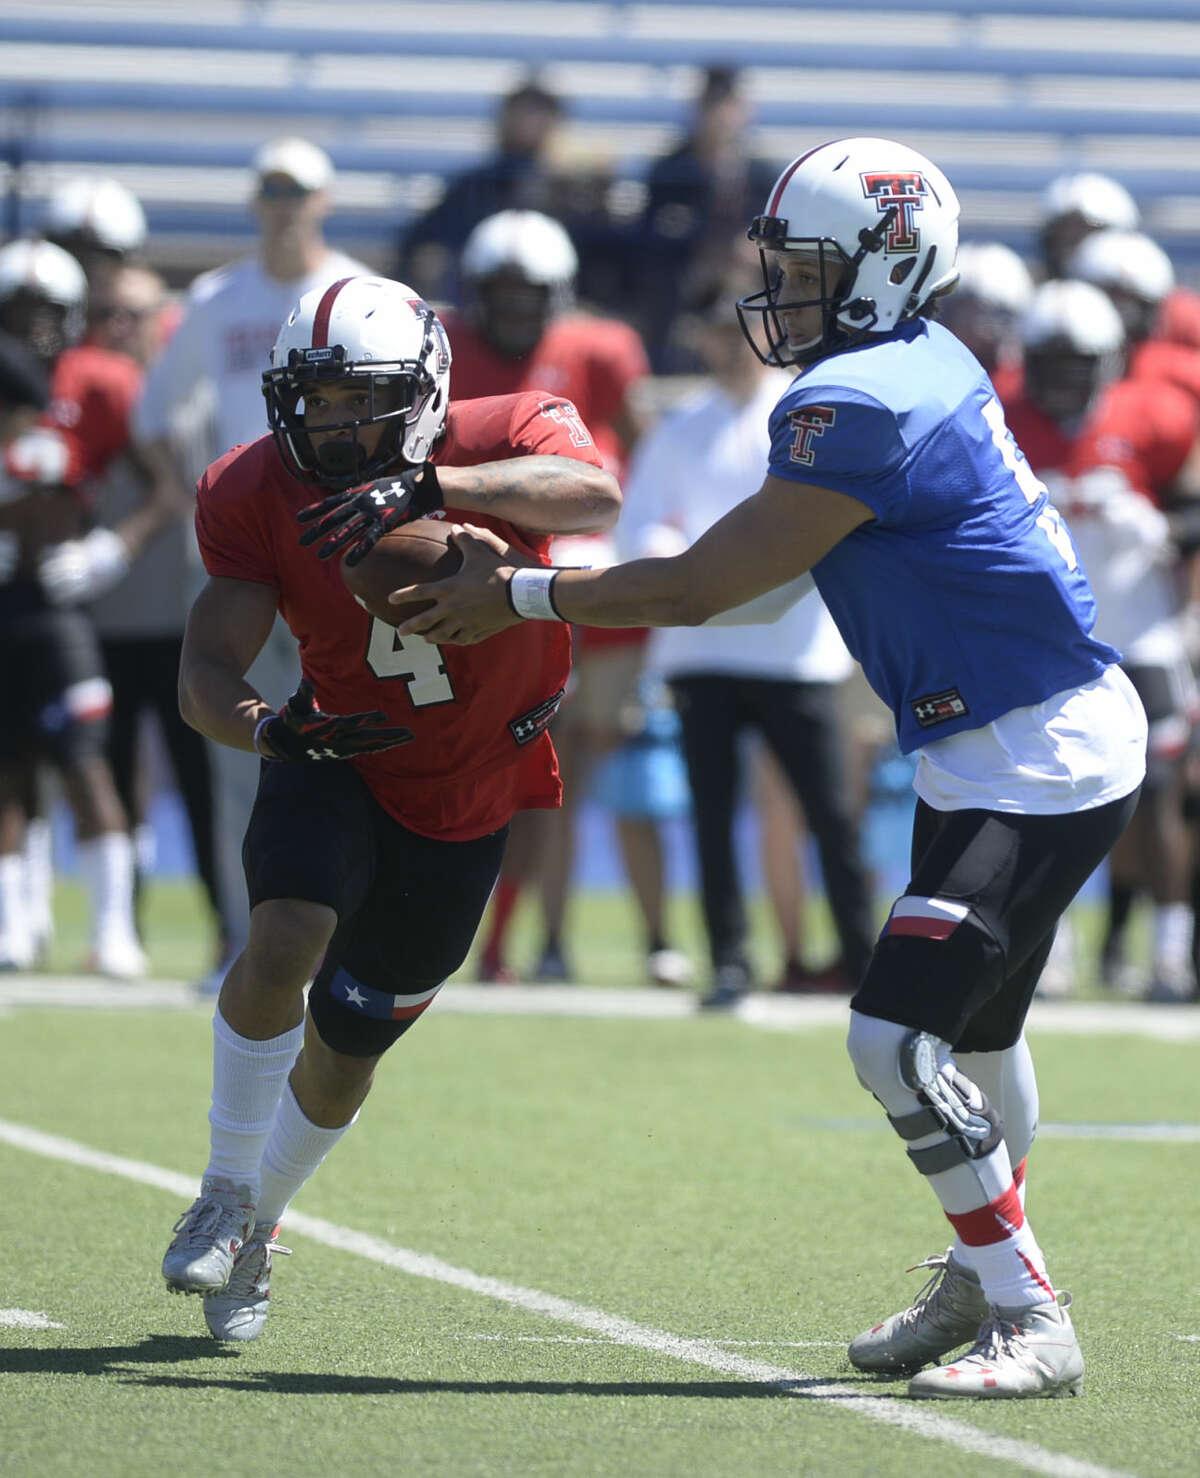 Texas Tech quarterback Patrick Mahomes II (5) hands off to running back Justin Stockton (4) during spring scrimmage Saturday, April 2, 2016, at Grande Communications Stadium. James Durbin/Reporter-Telegram